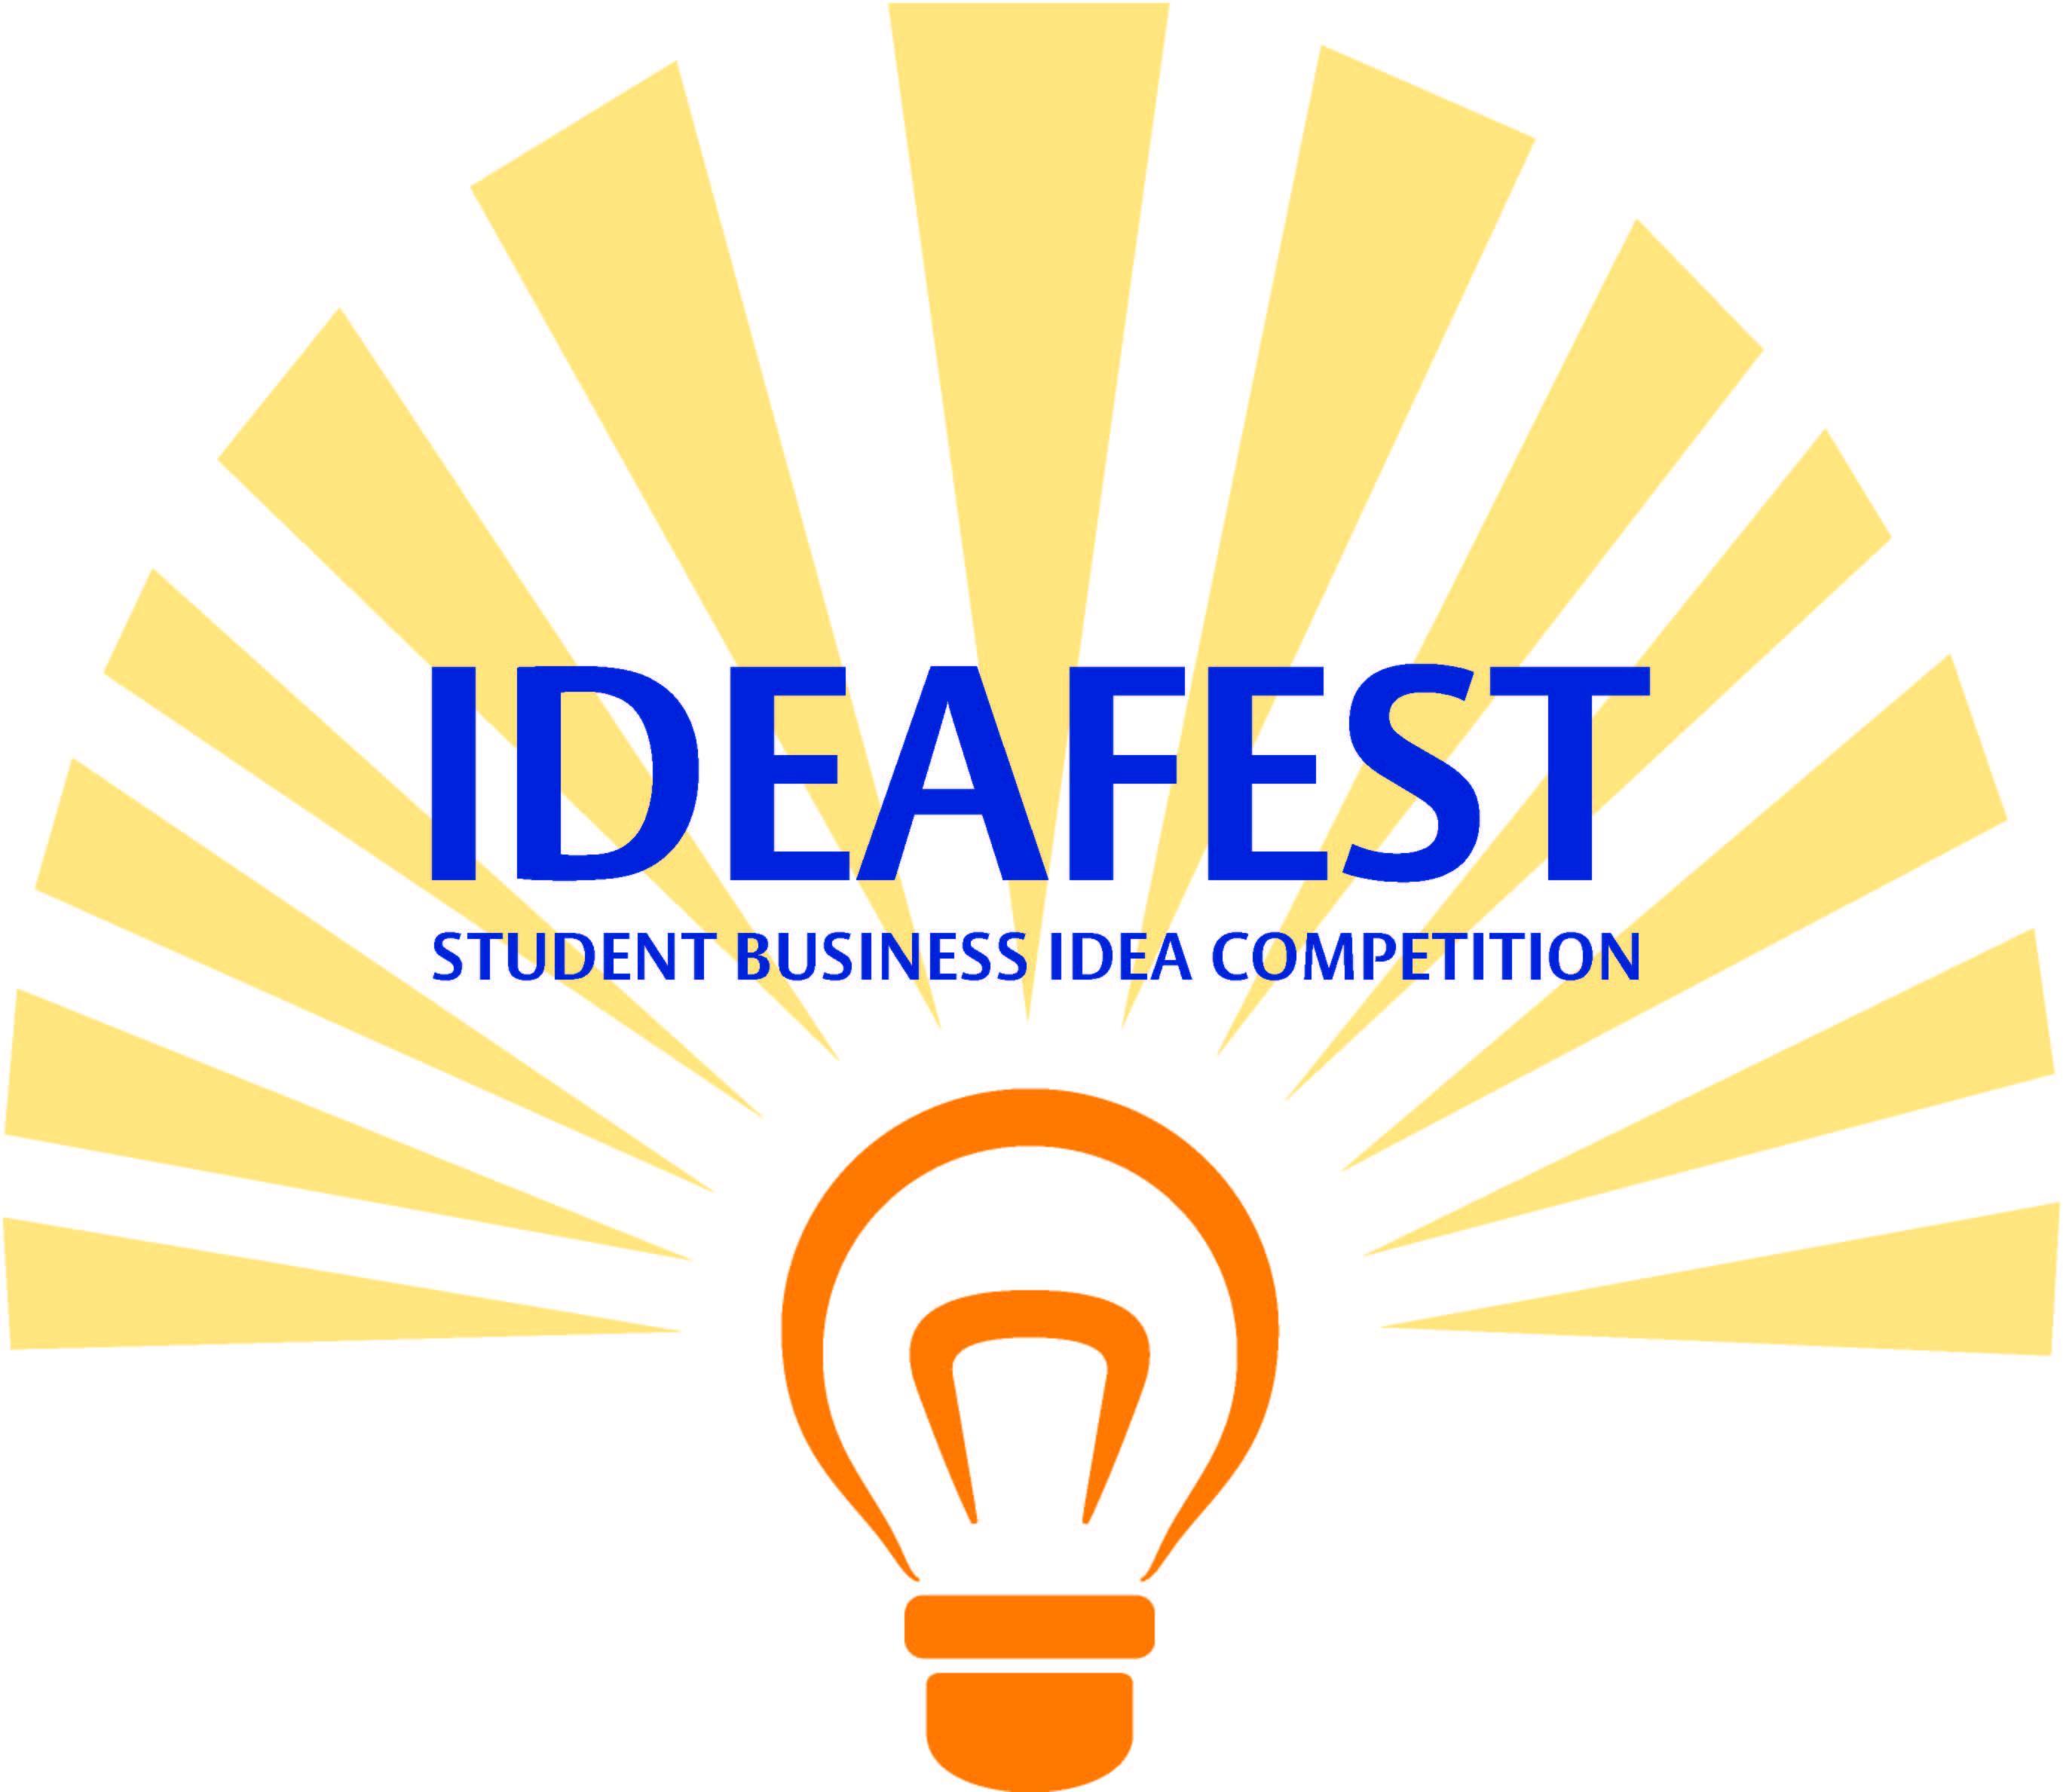 Ideafest-logo.jpg?mtime=20180430105500#asset:93153